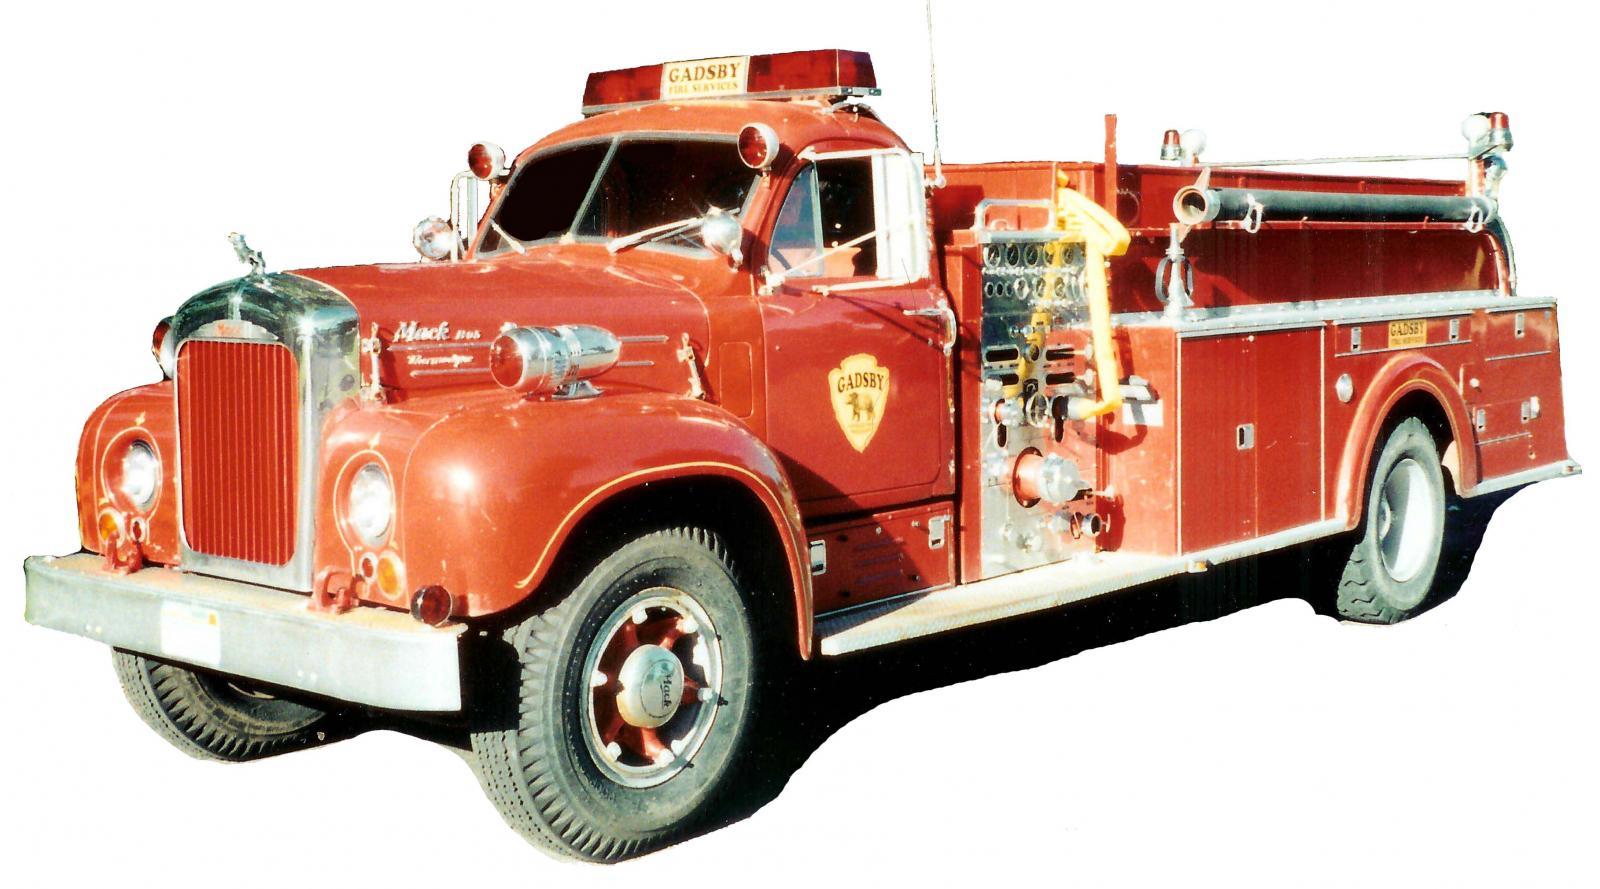 Mack B95 For Sale Fire Apparatus Bigmacktrucks Com